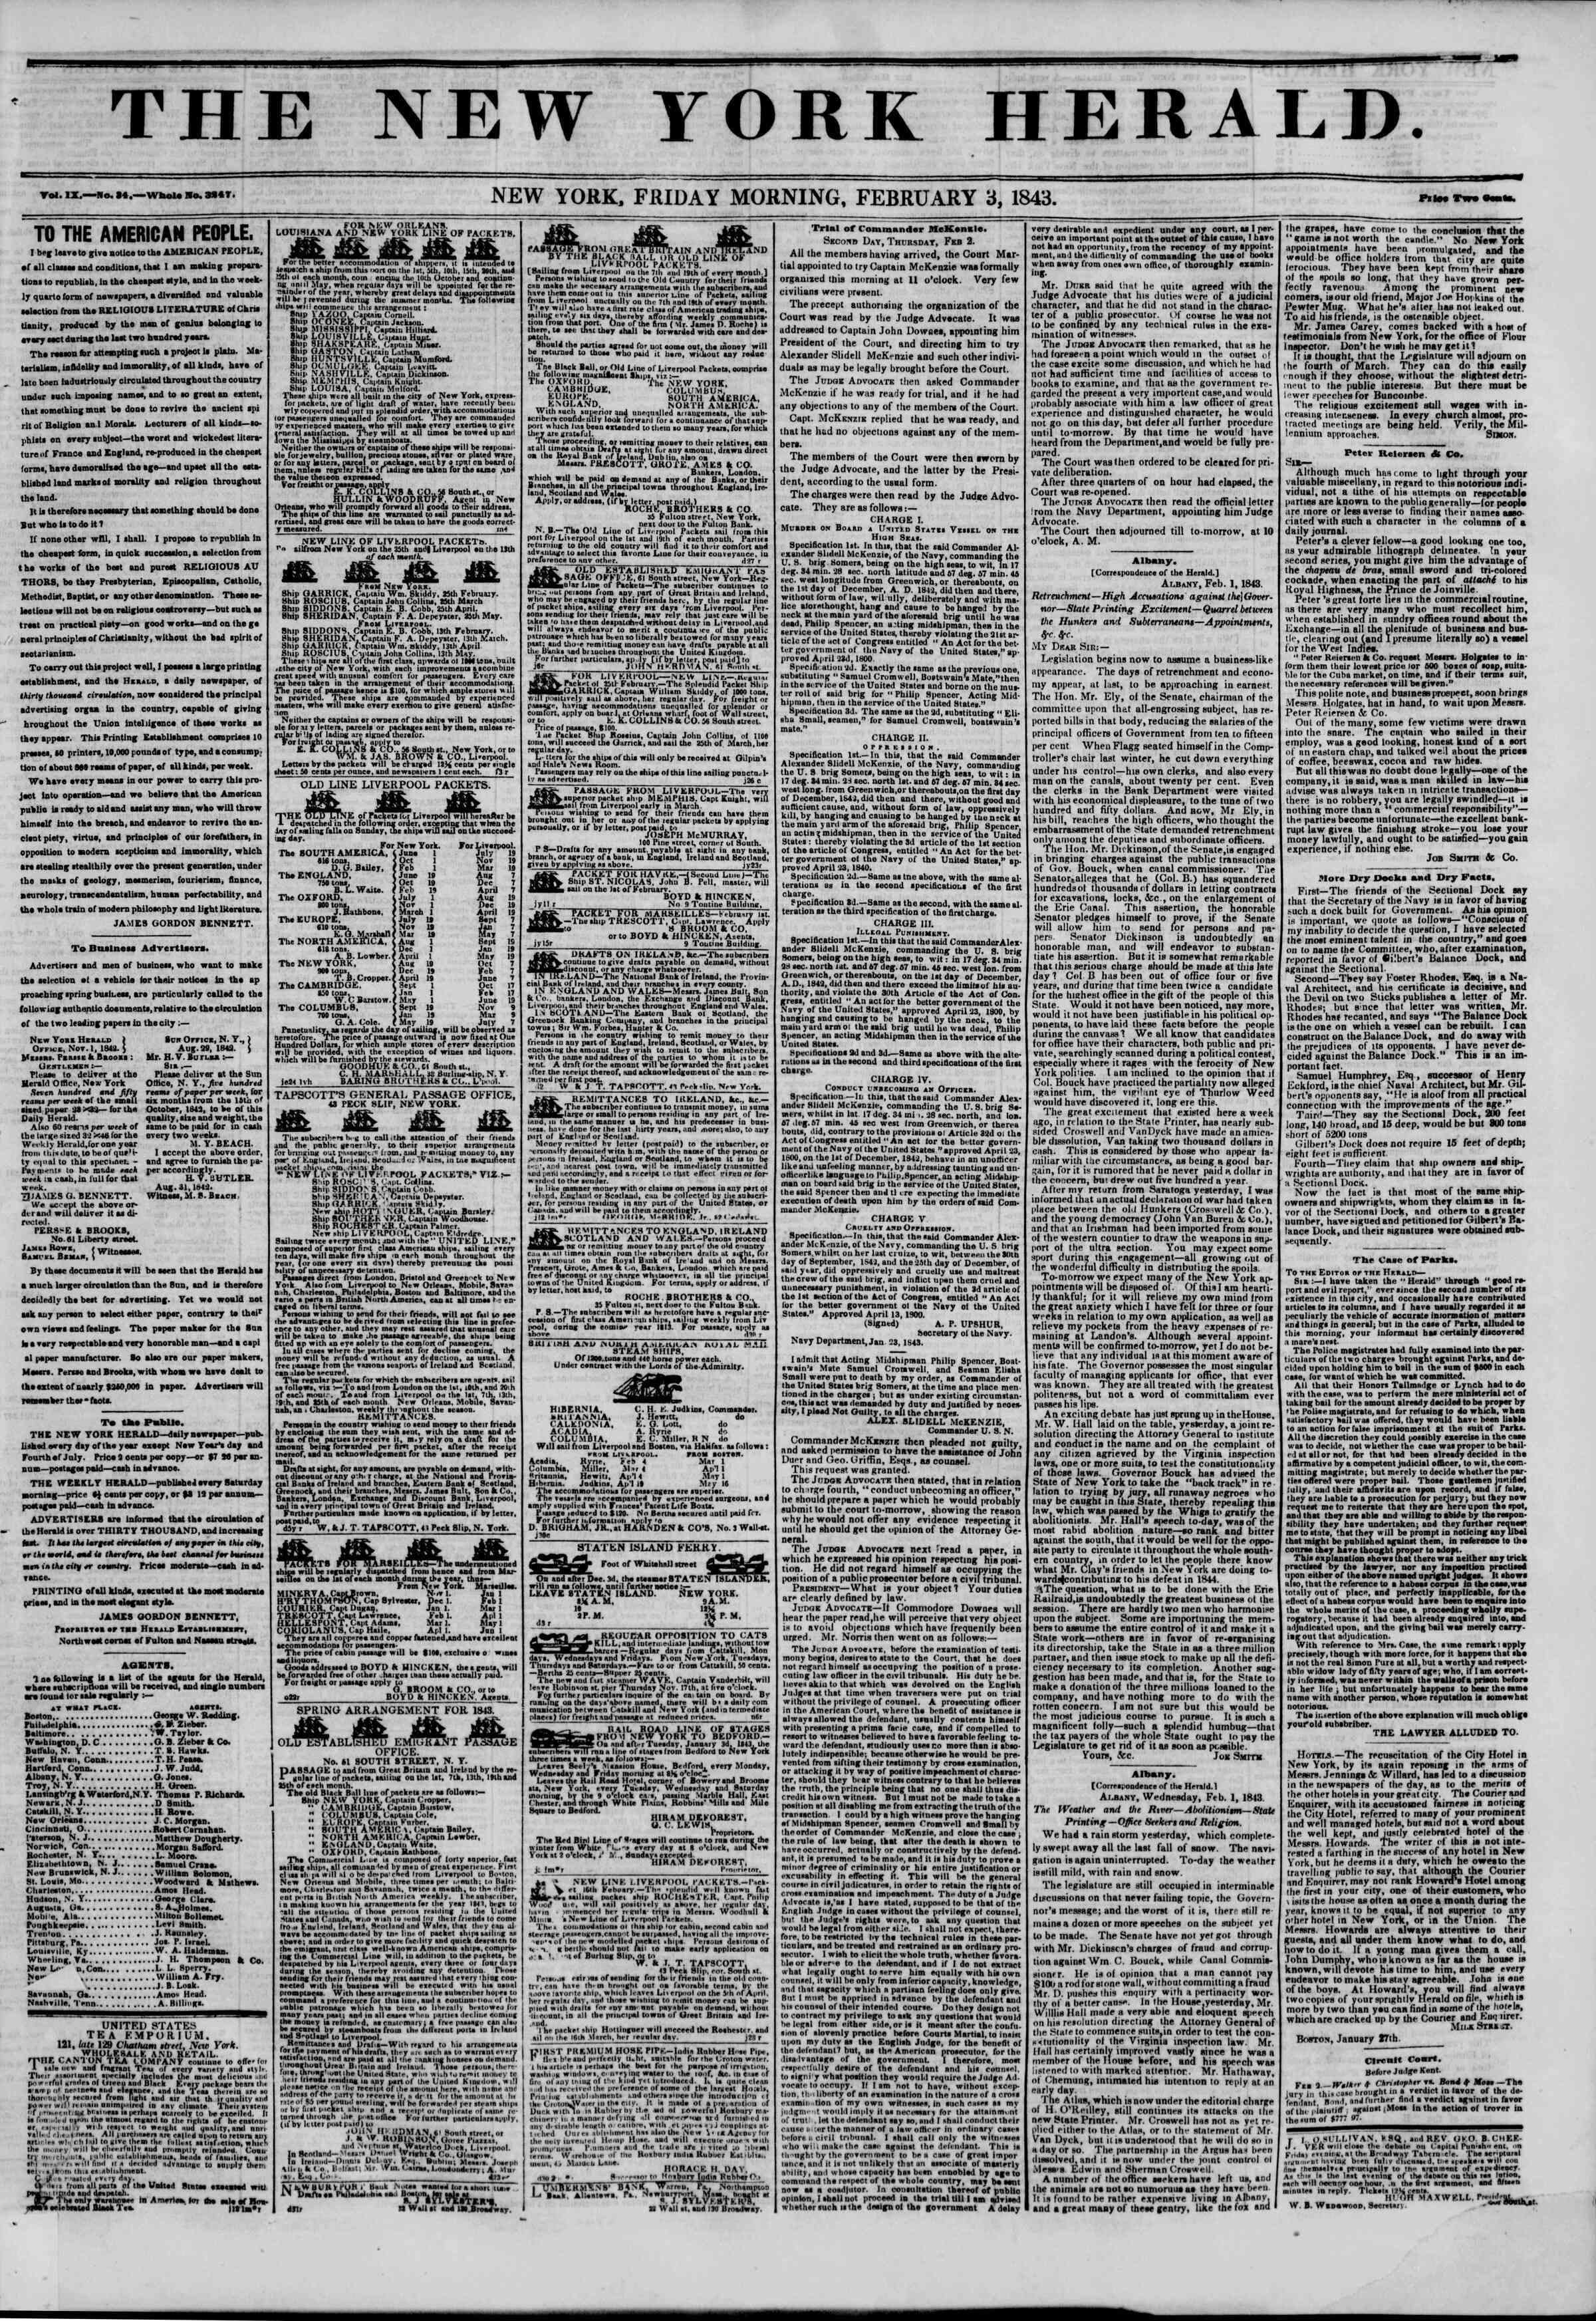 February 3, 1843 Tarihli The New York Herald Gazetesi Sayfa 1